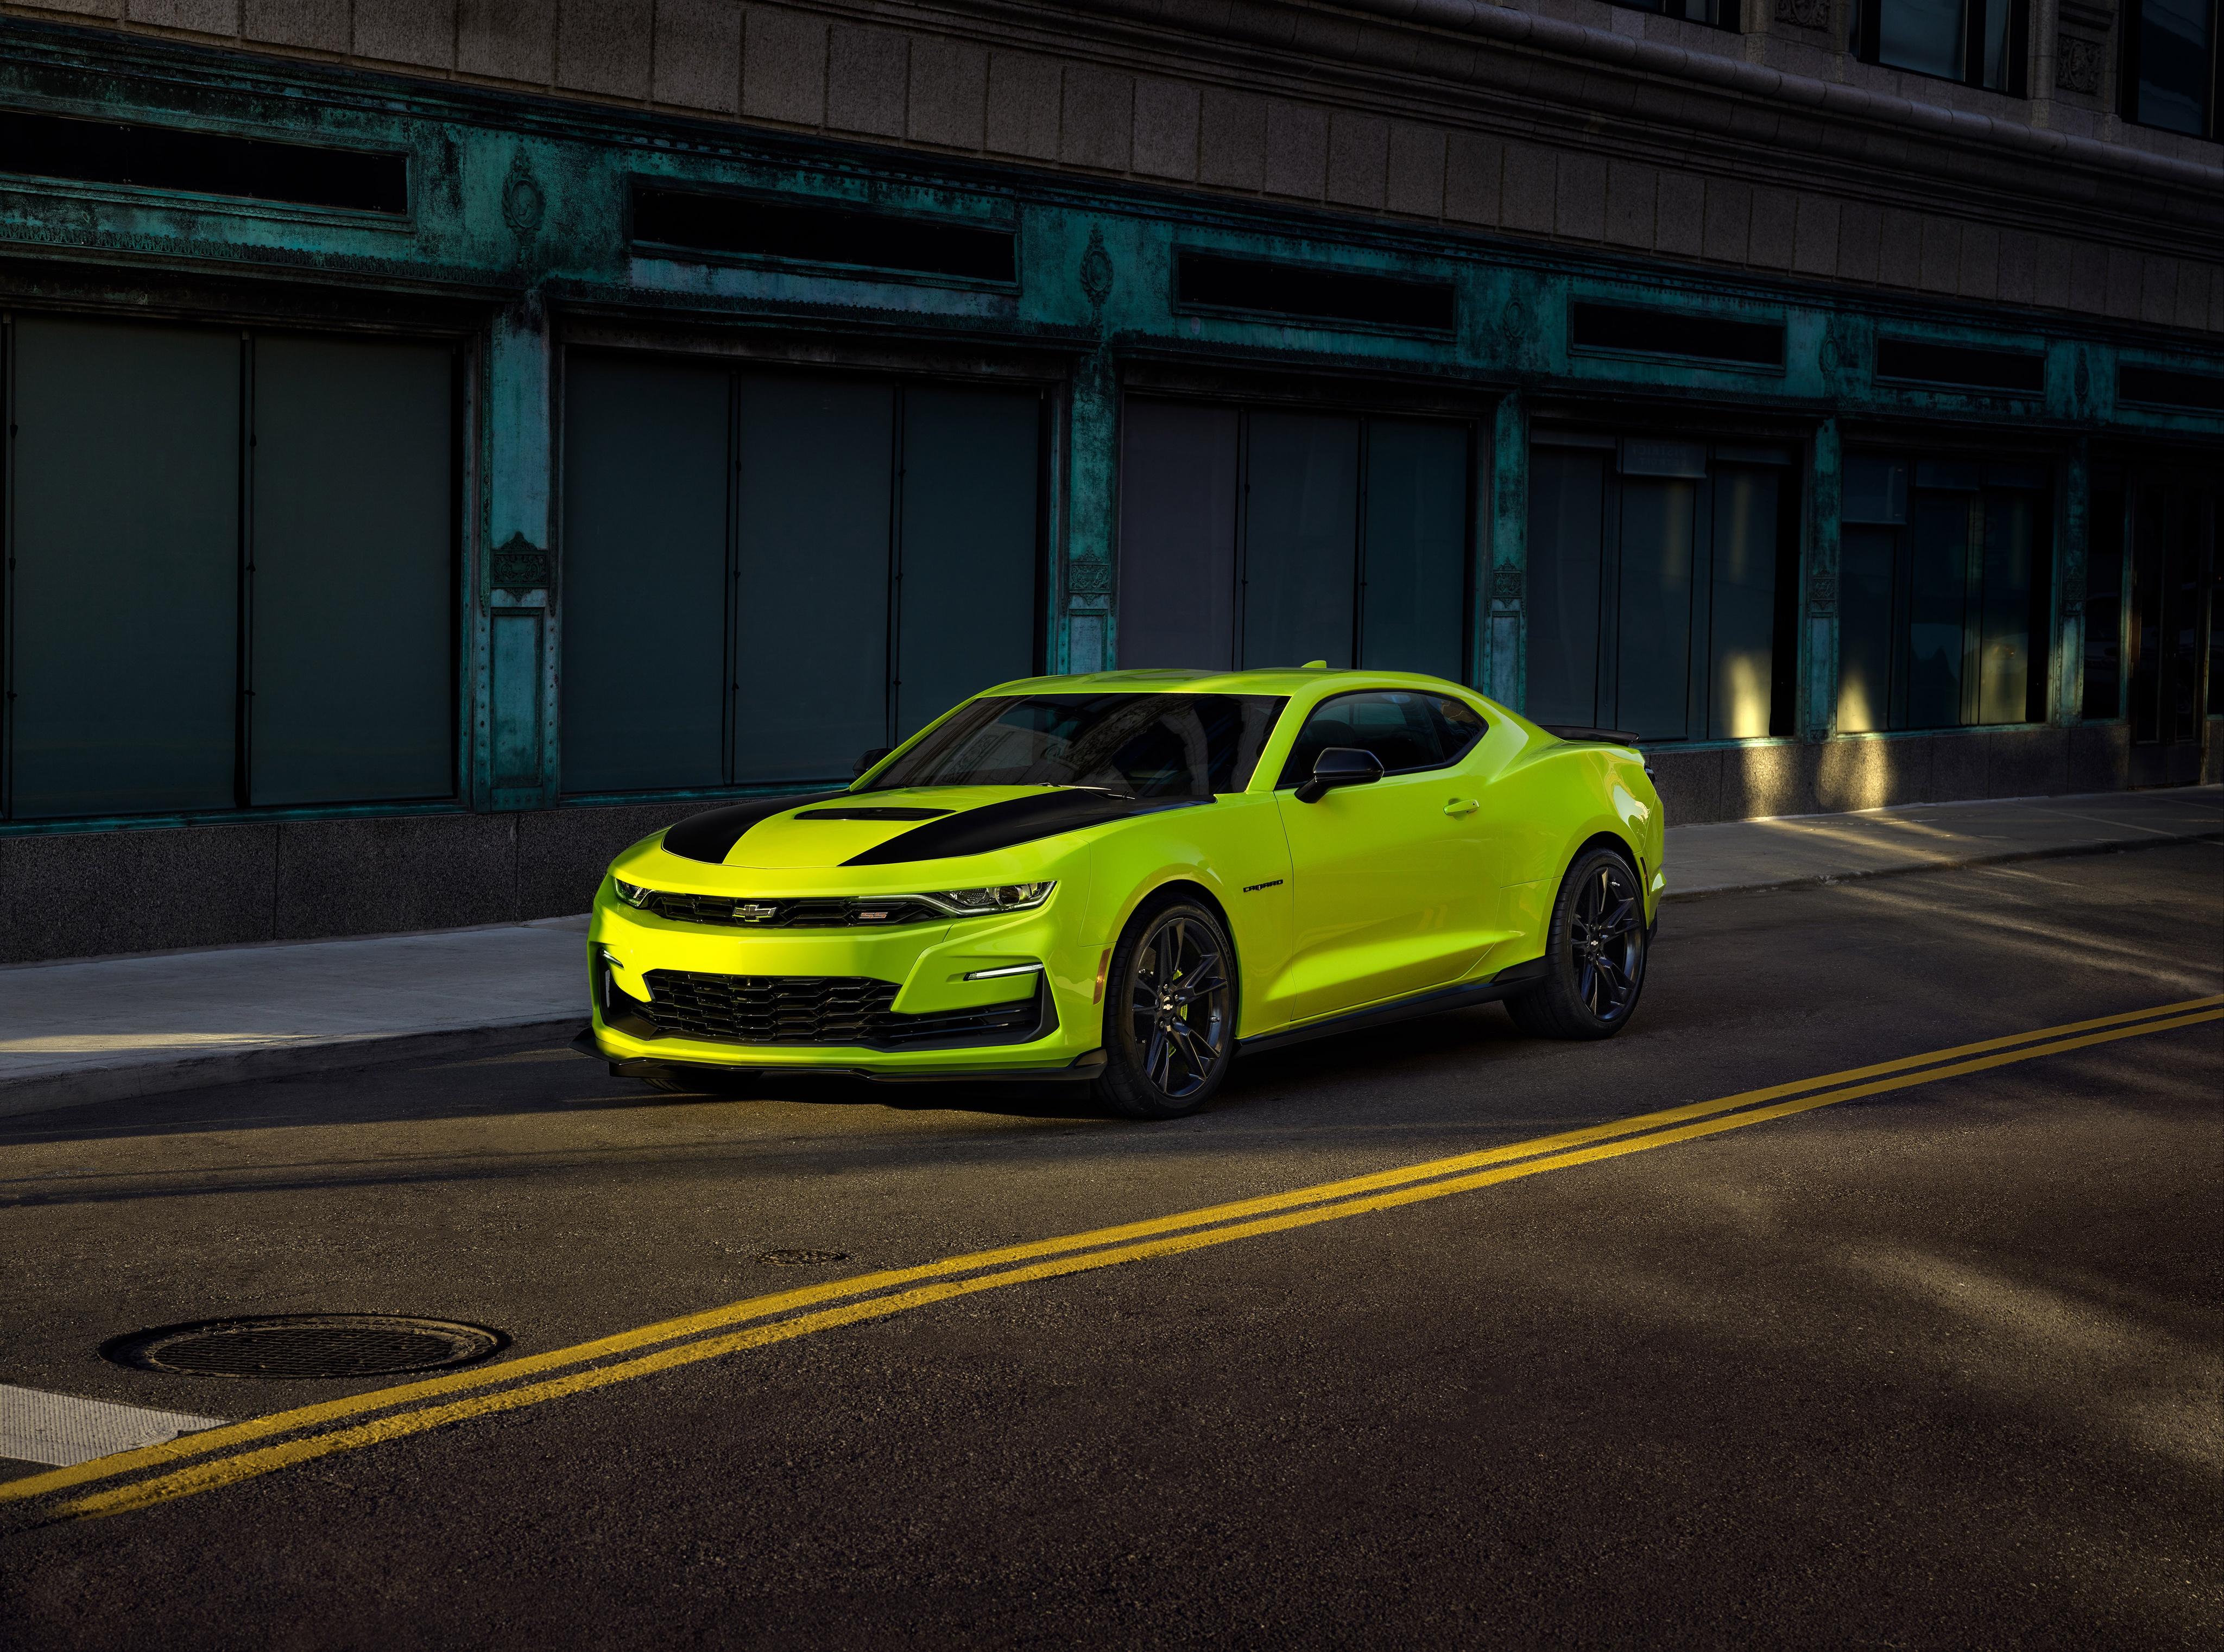 Chevrolet Camaro Ss 4k Ultra Hd Wallpaper Background Image 4096x3043 Id 958194 Wallpaper Abyss